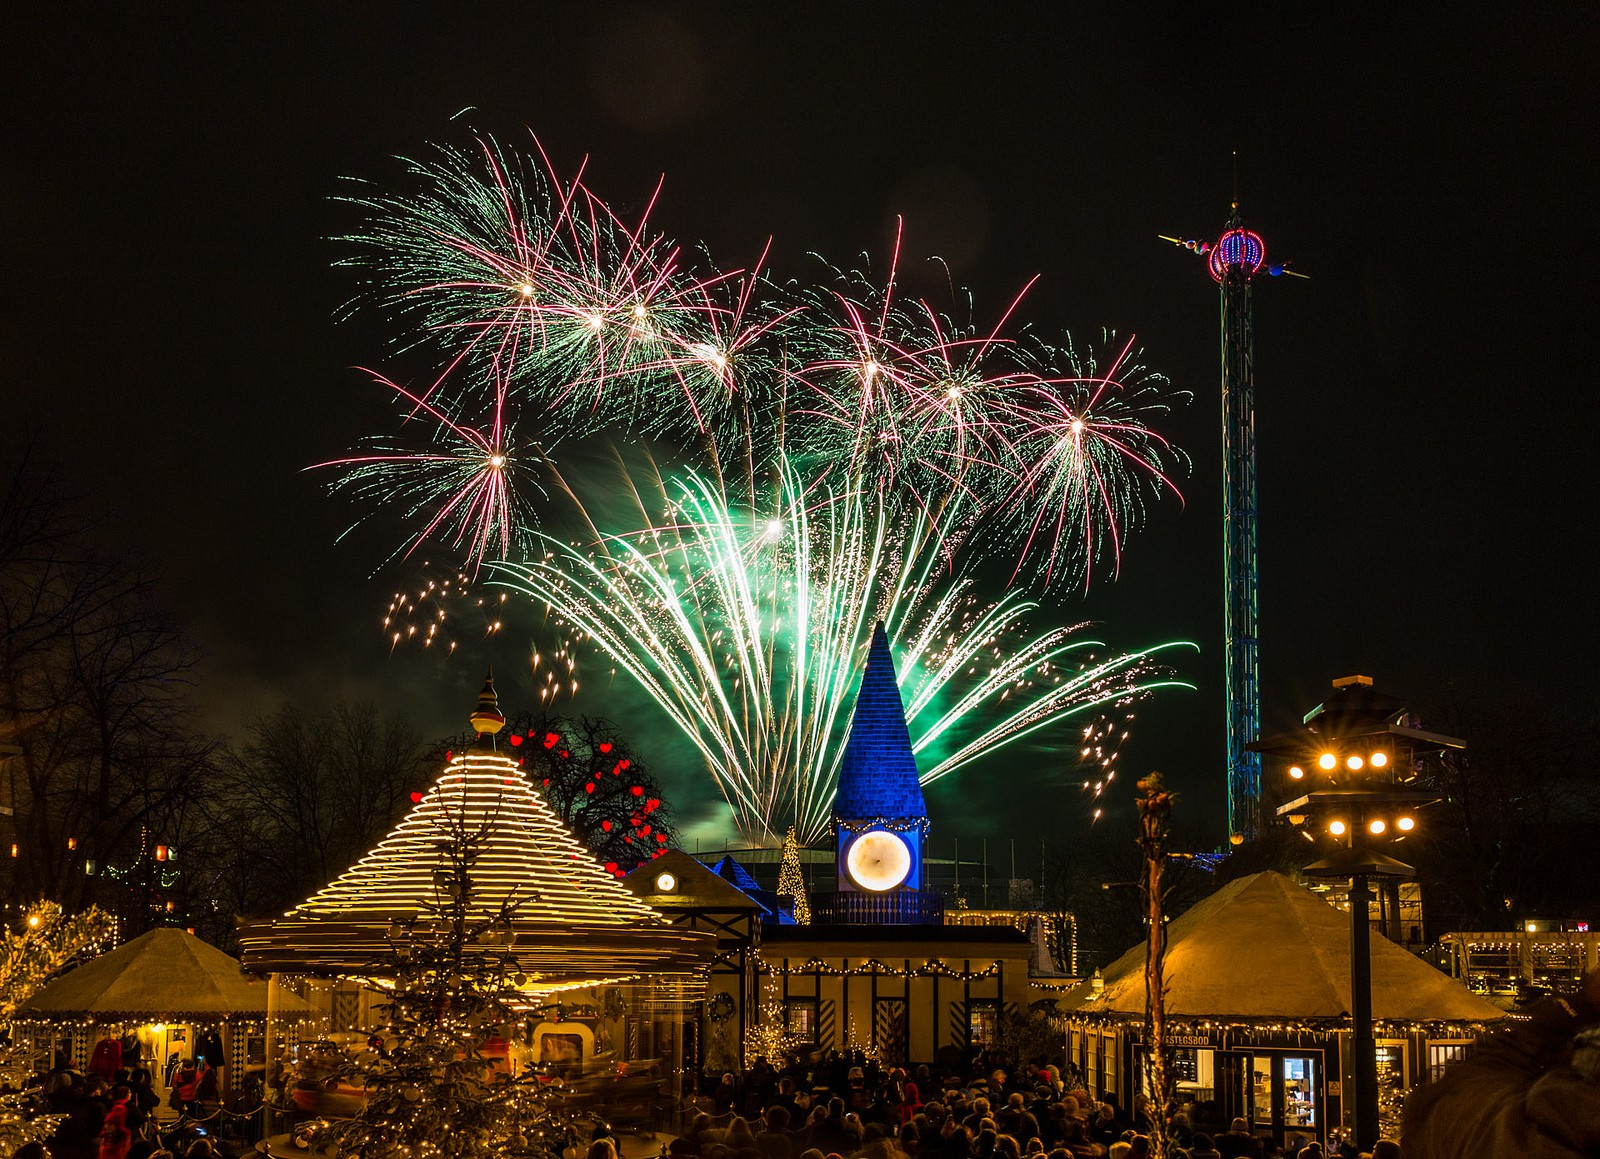 New Years fireworks in Tivoli gardens | © Thomas Rousing/Flickr